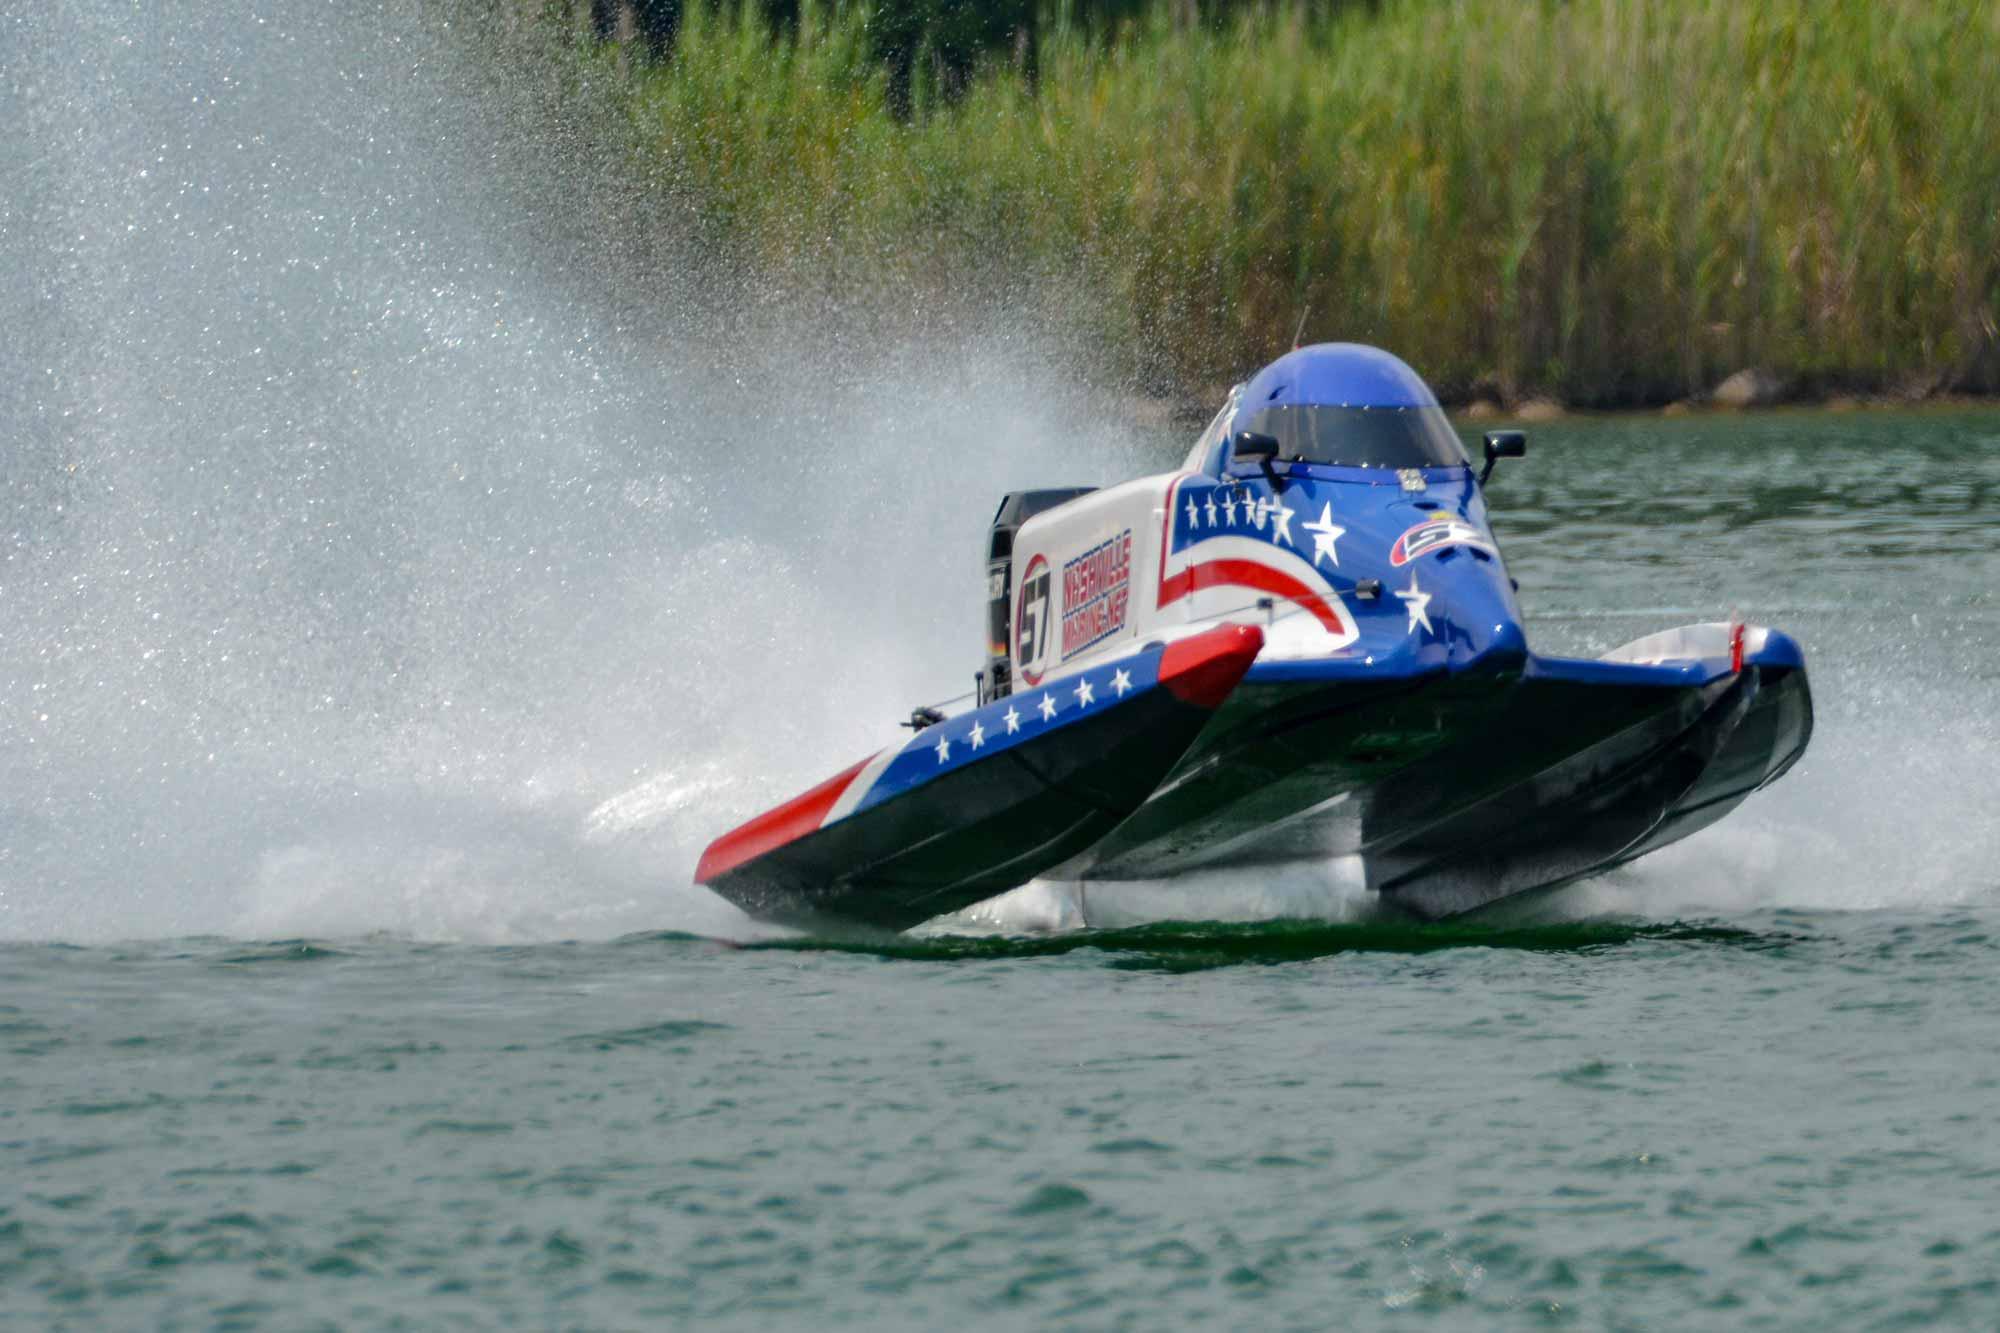 McMurray-Racing-Nashvill-Marine-2021-Springfield-F1-Race-16